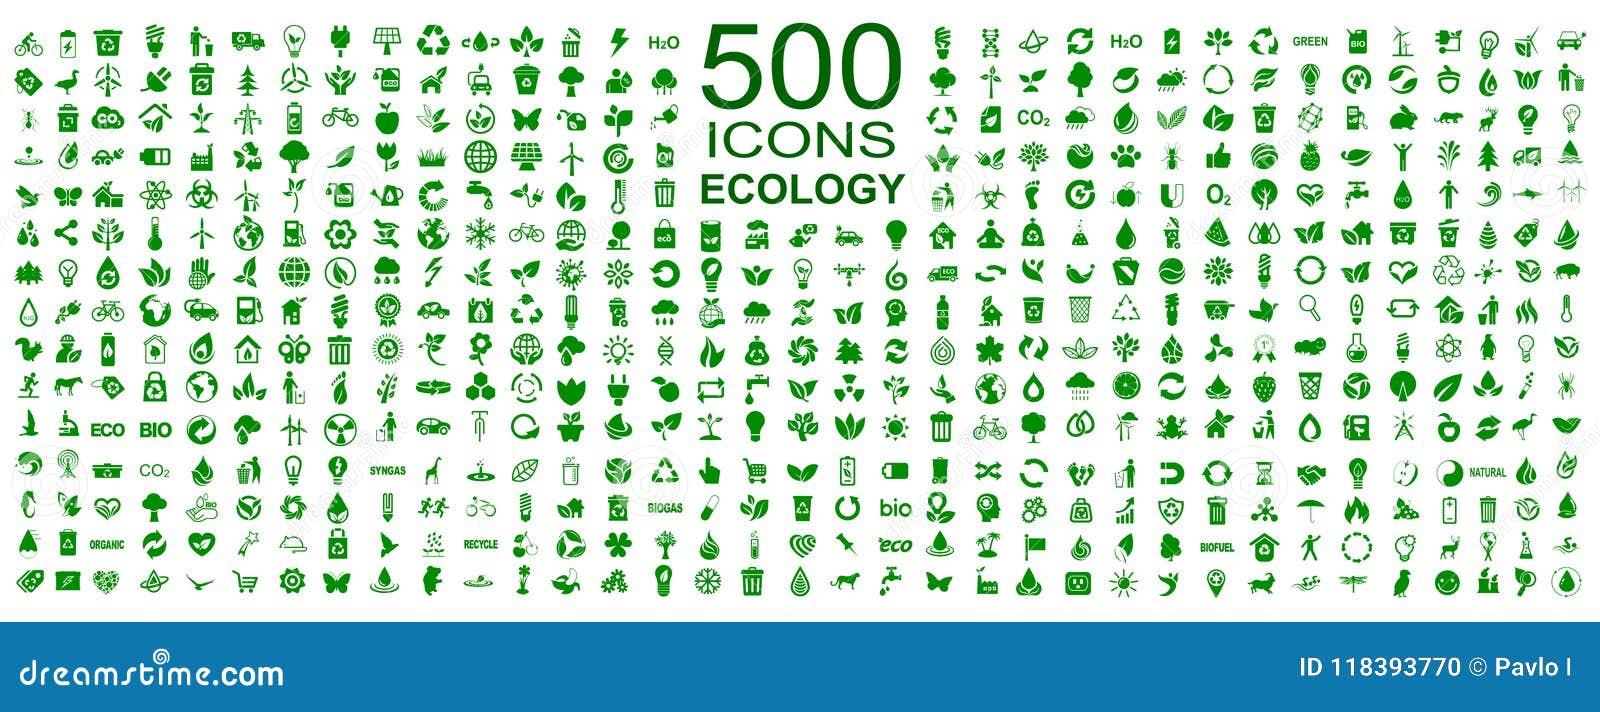 Satz von 500 Ökologieikonen - Vektor